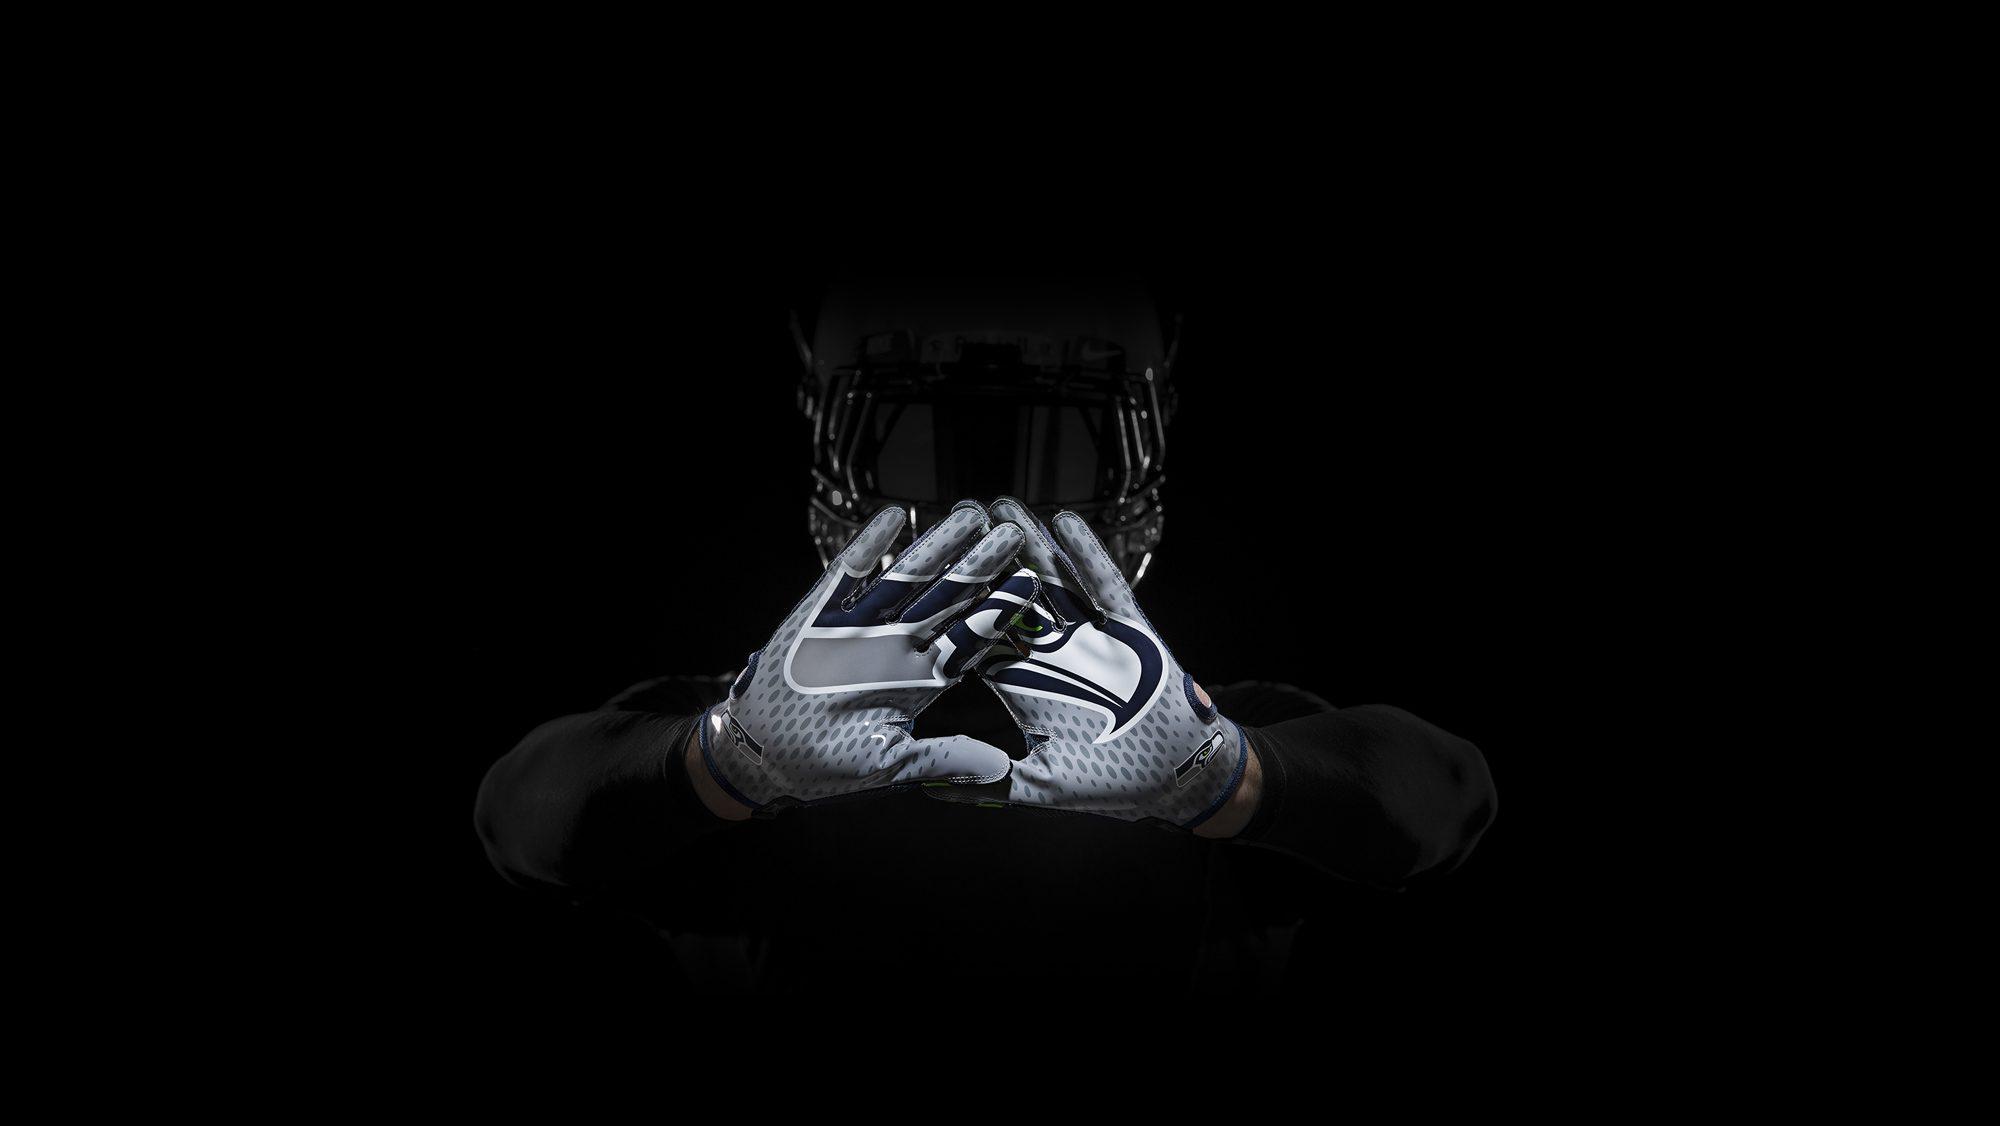 Bmf Gridiron Nfl Nike Super Bowl Xlix Collection